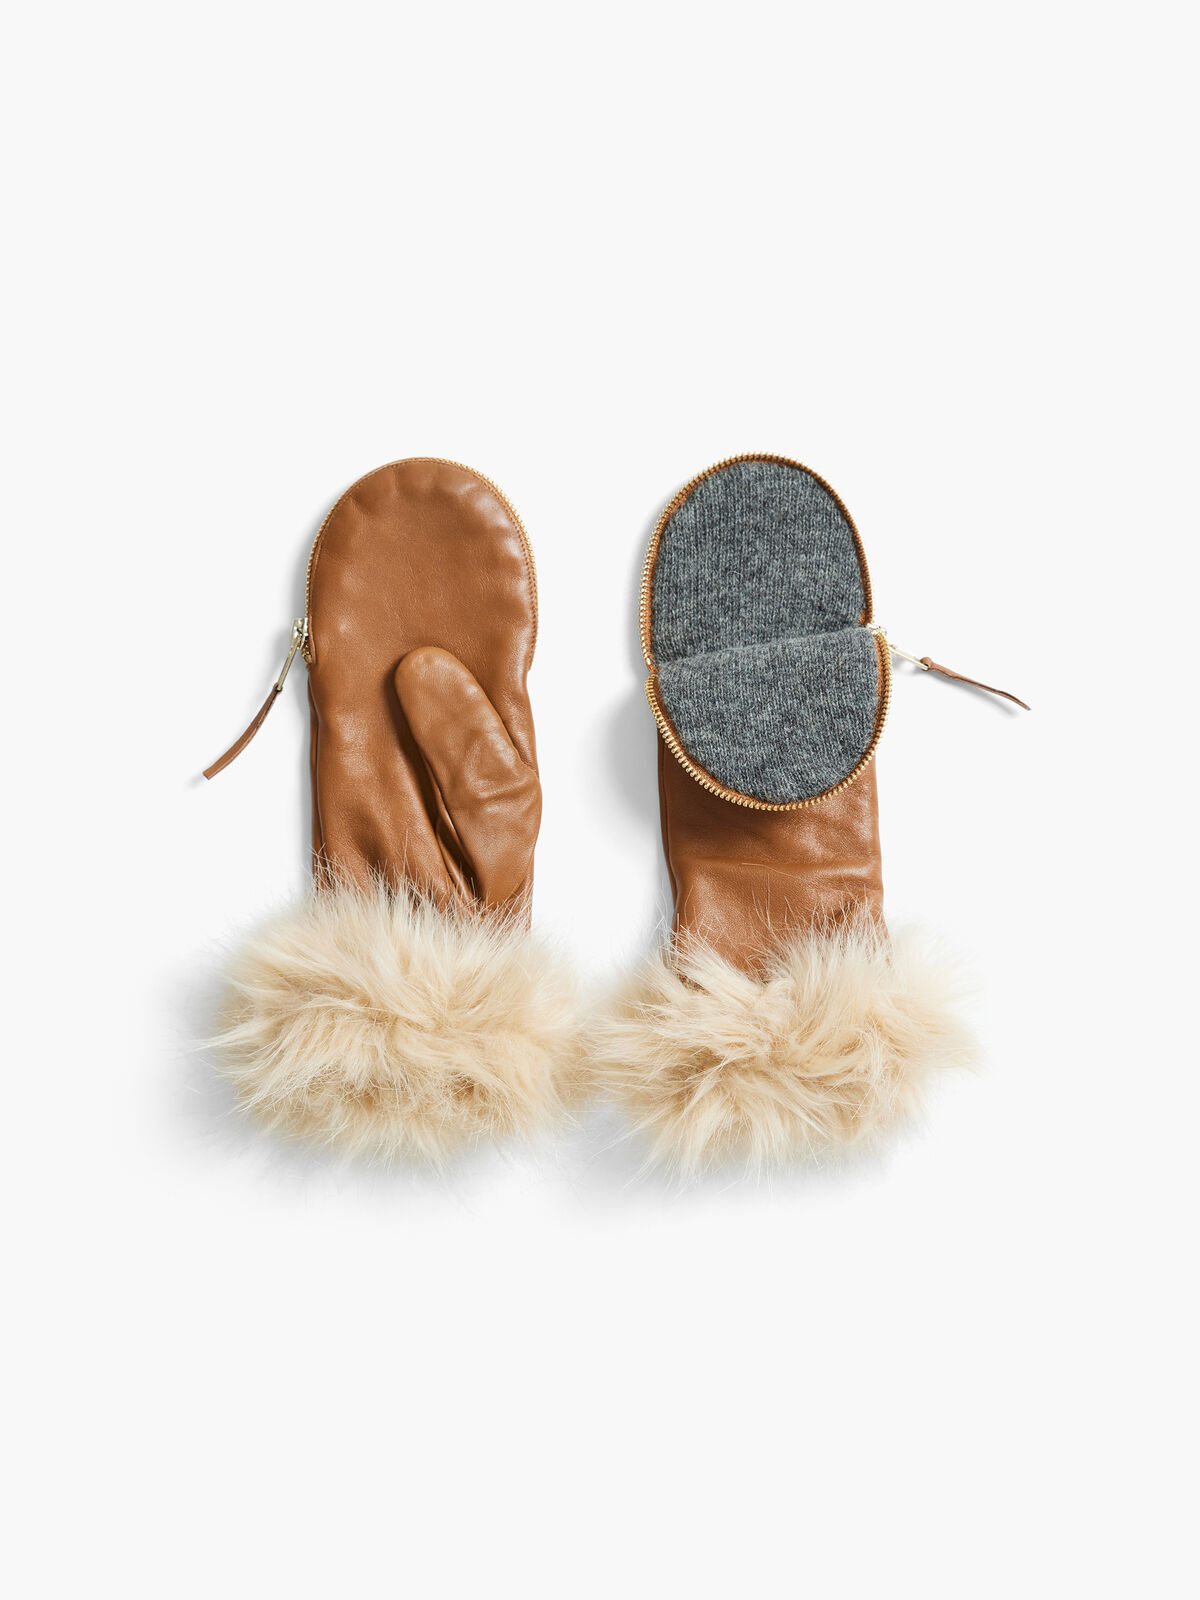 Amato Zipper Mitten w/ Faux Fur Mouton Cuff